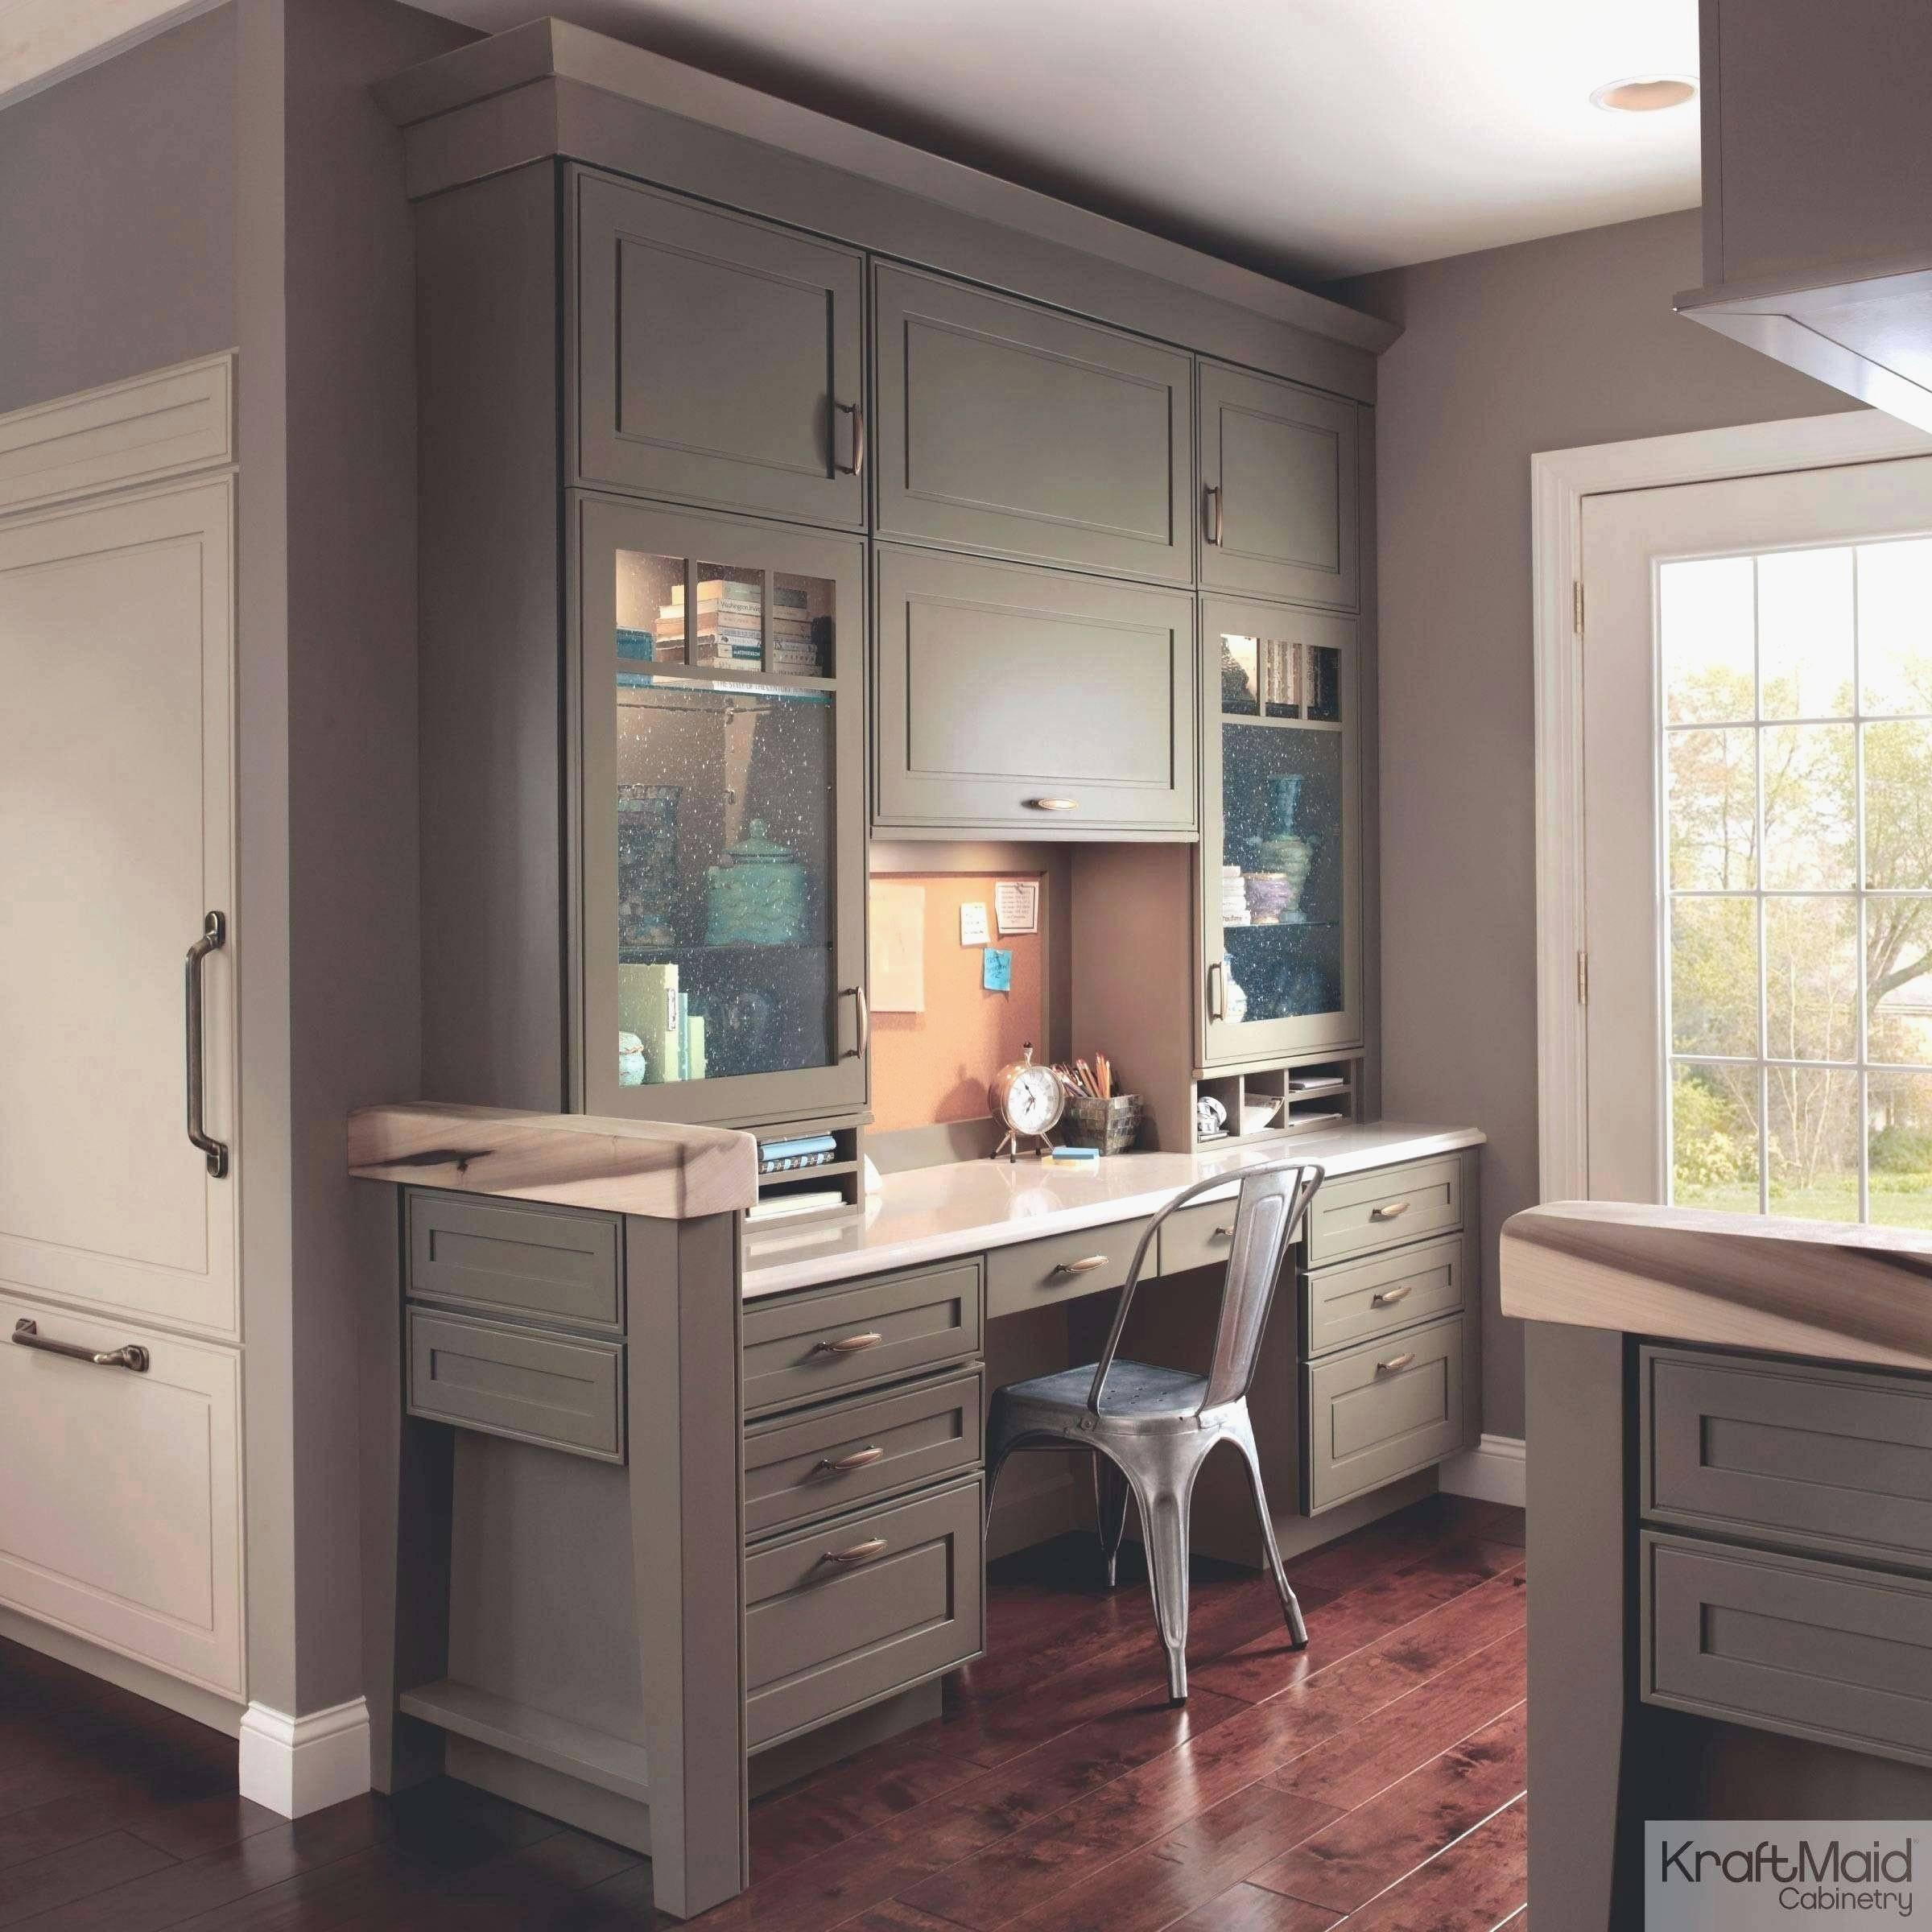 kitchens with grey hardwood floors of elegant white kitchen cabinets elegant 30 grey kitchen white intended for kitchen cabinets with dark wood floors elegant pickled maple kitchen cabinets